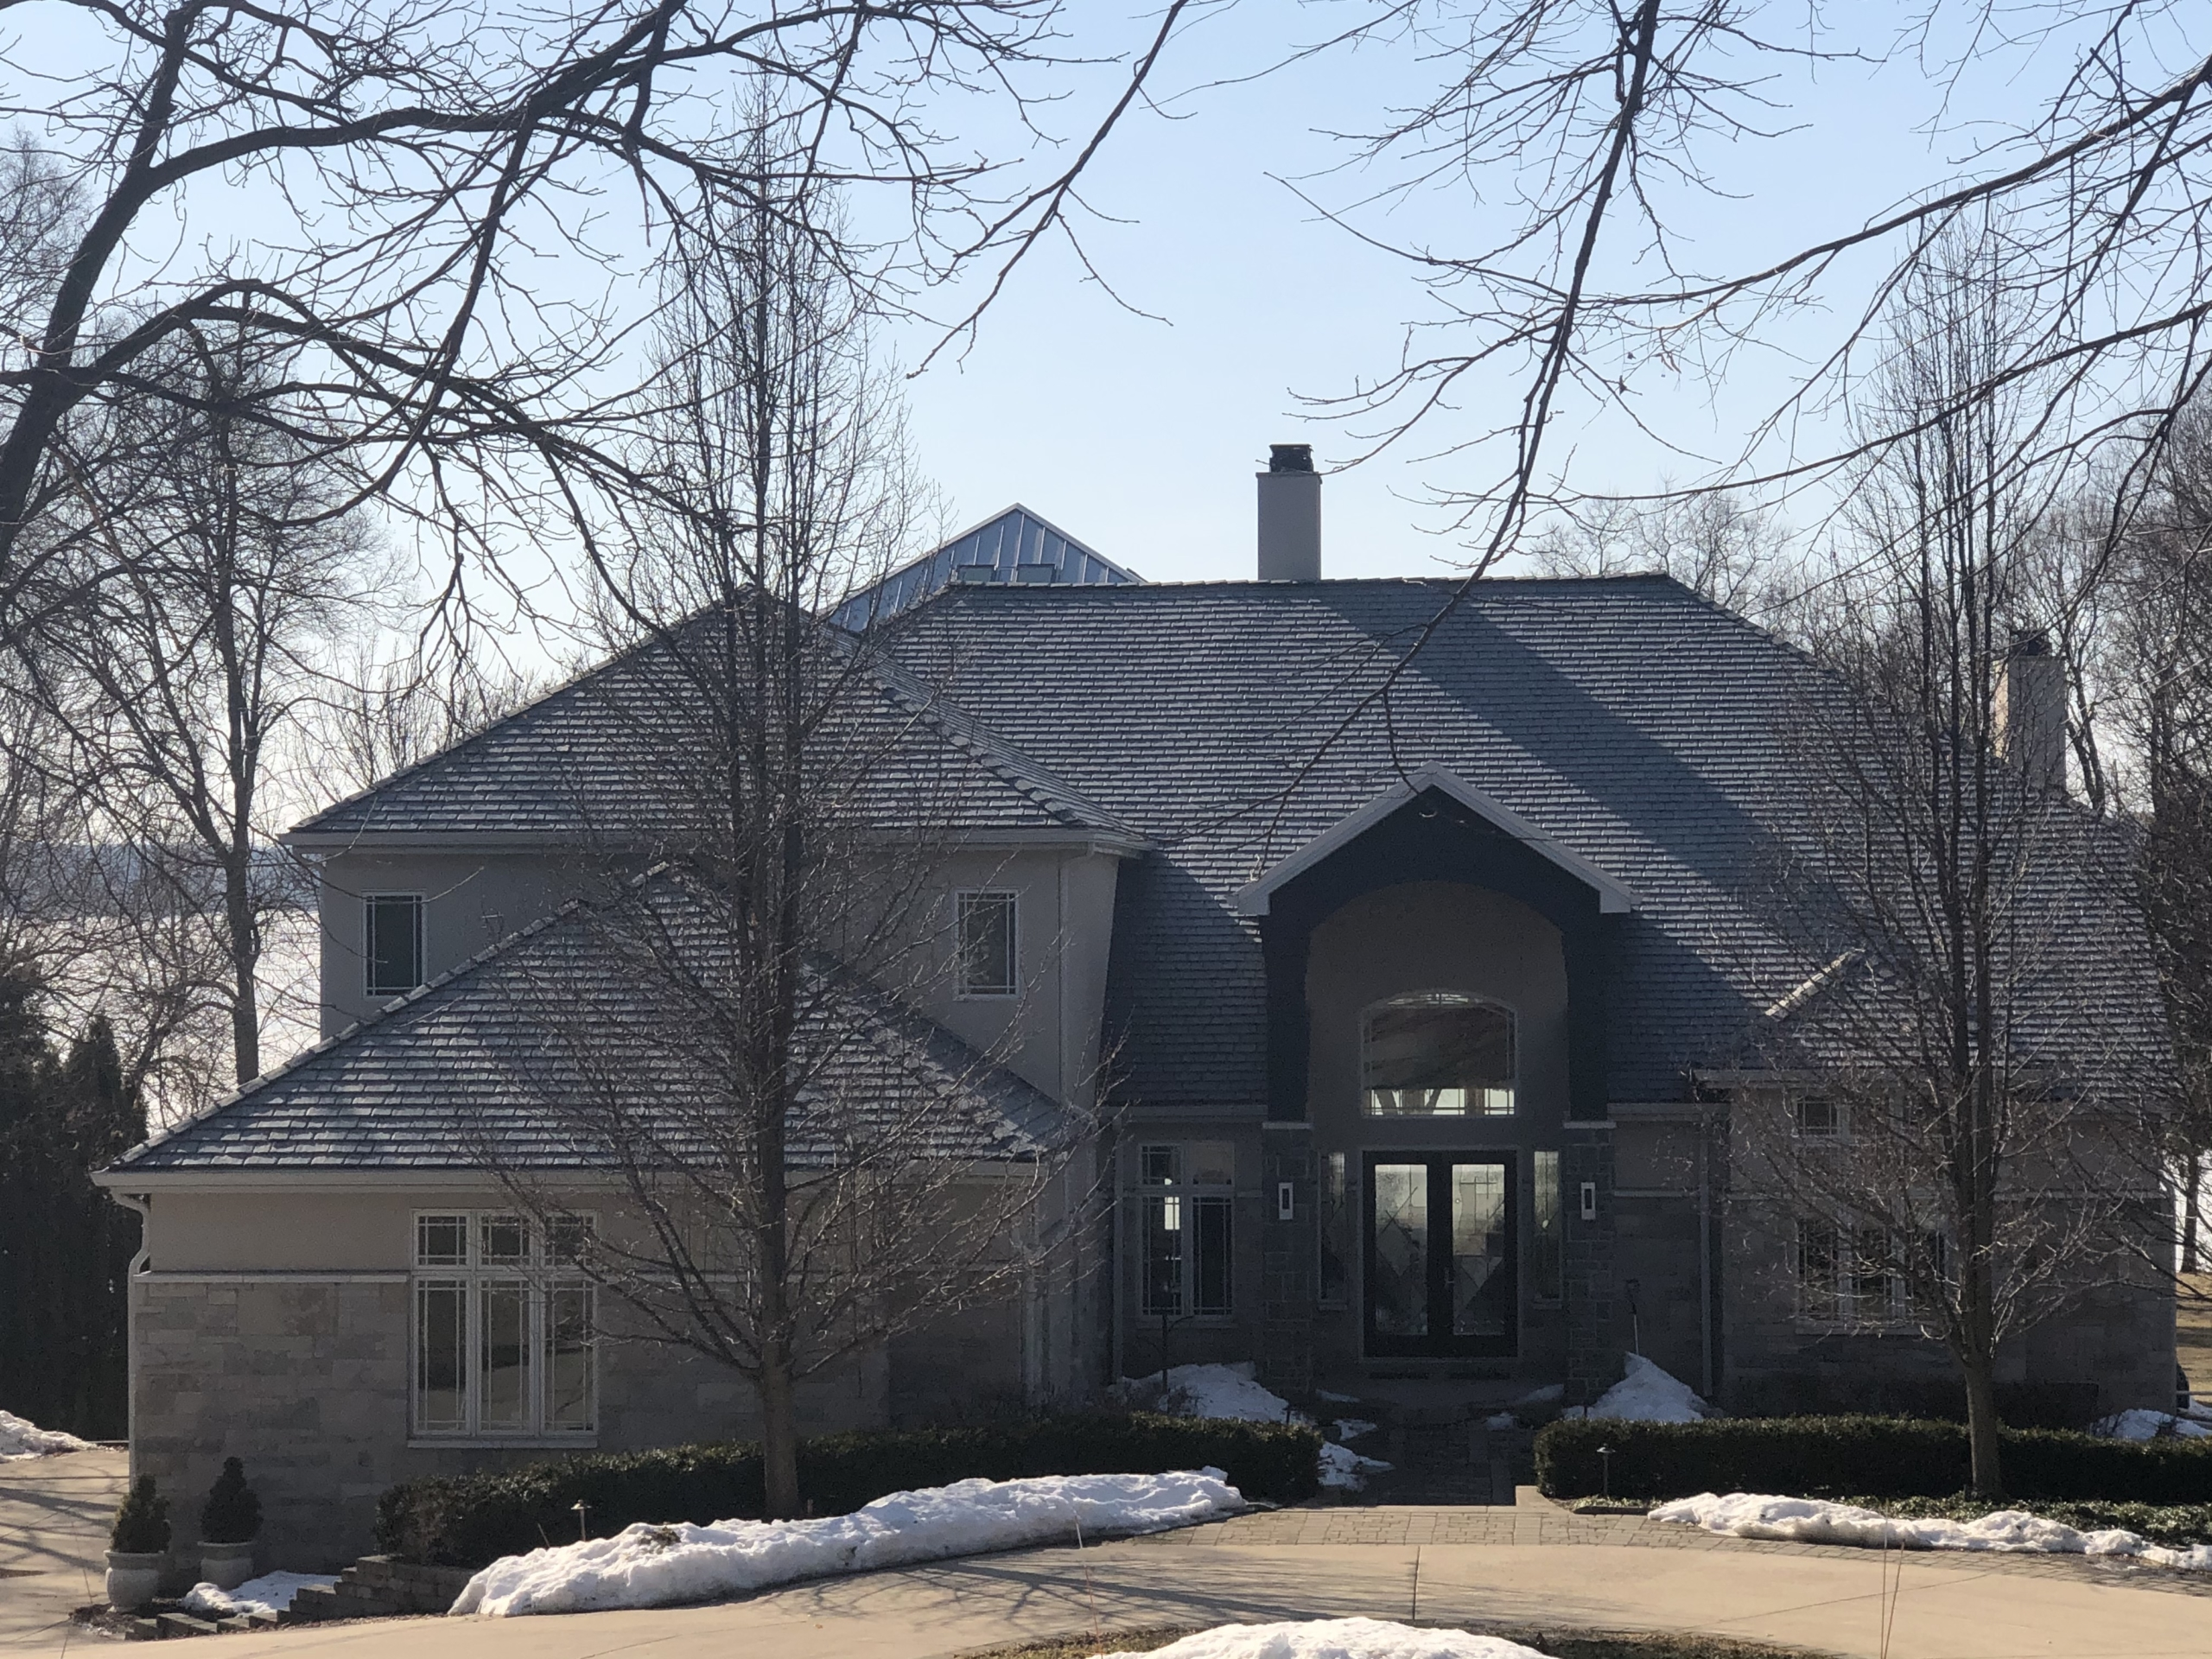 Wisconsin Roofing LLC | Residential | Mequon | New Certainteed Landmark Pro Moore Black Shingles